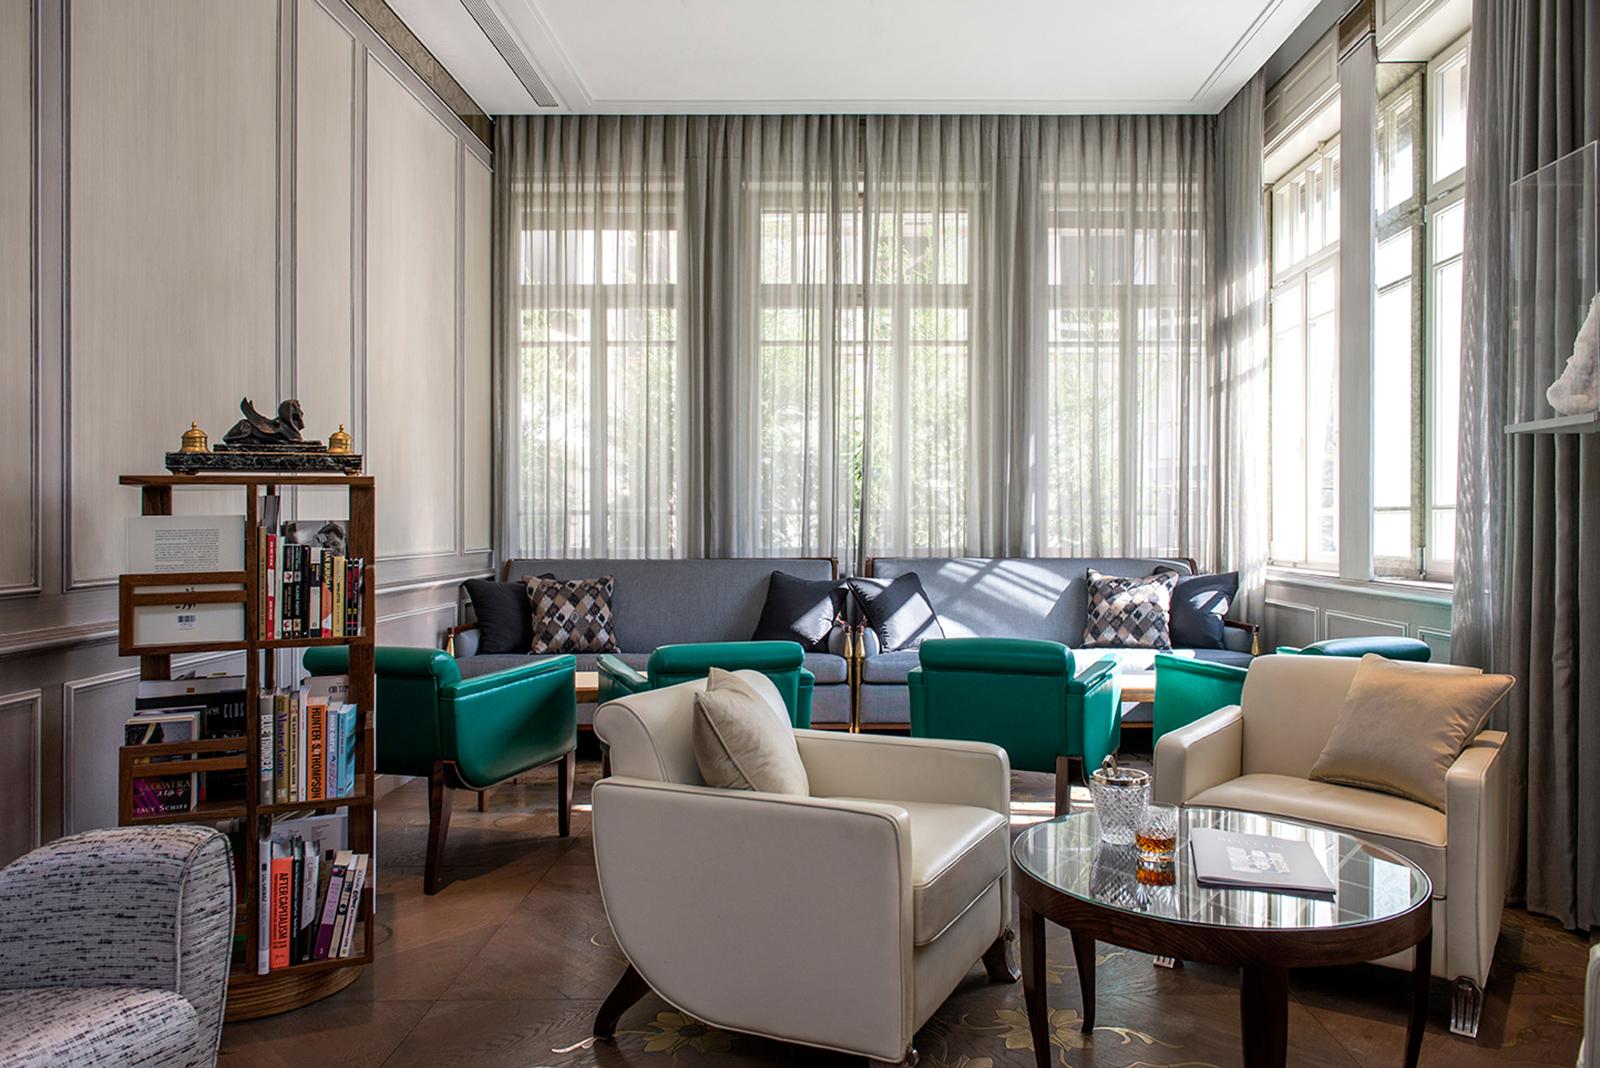 Israeli design hotels: the Norman hotel